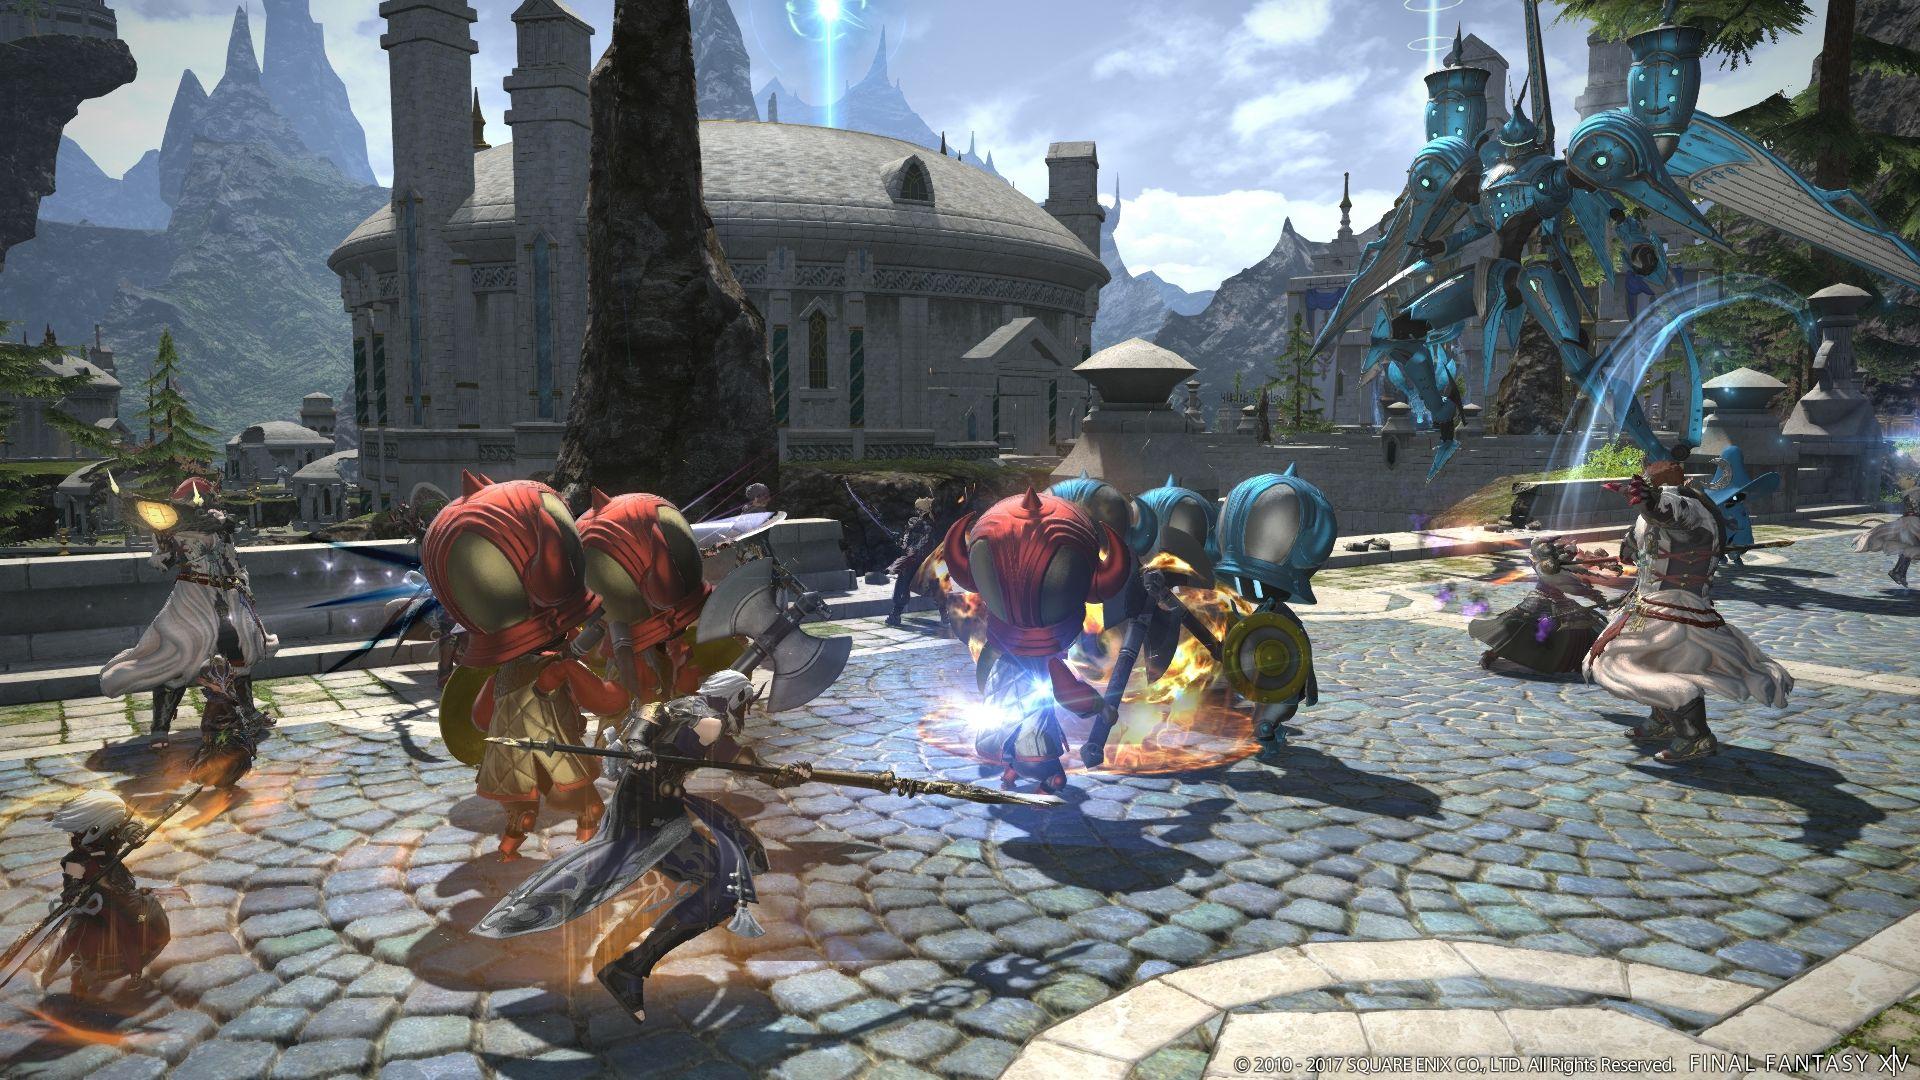 final-fantasy-xiv-update-4-1-the-legend-returns-mmorpg-square-enix_020